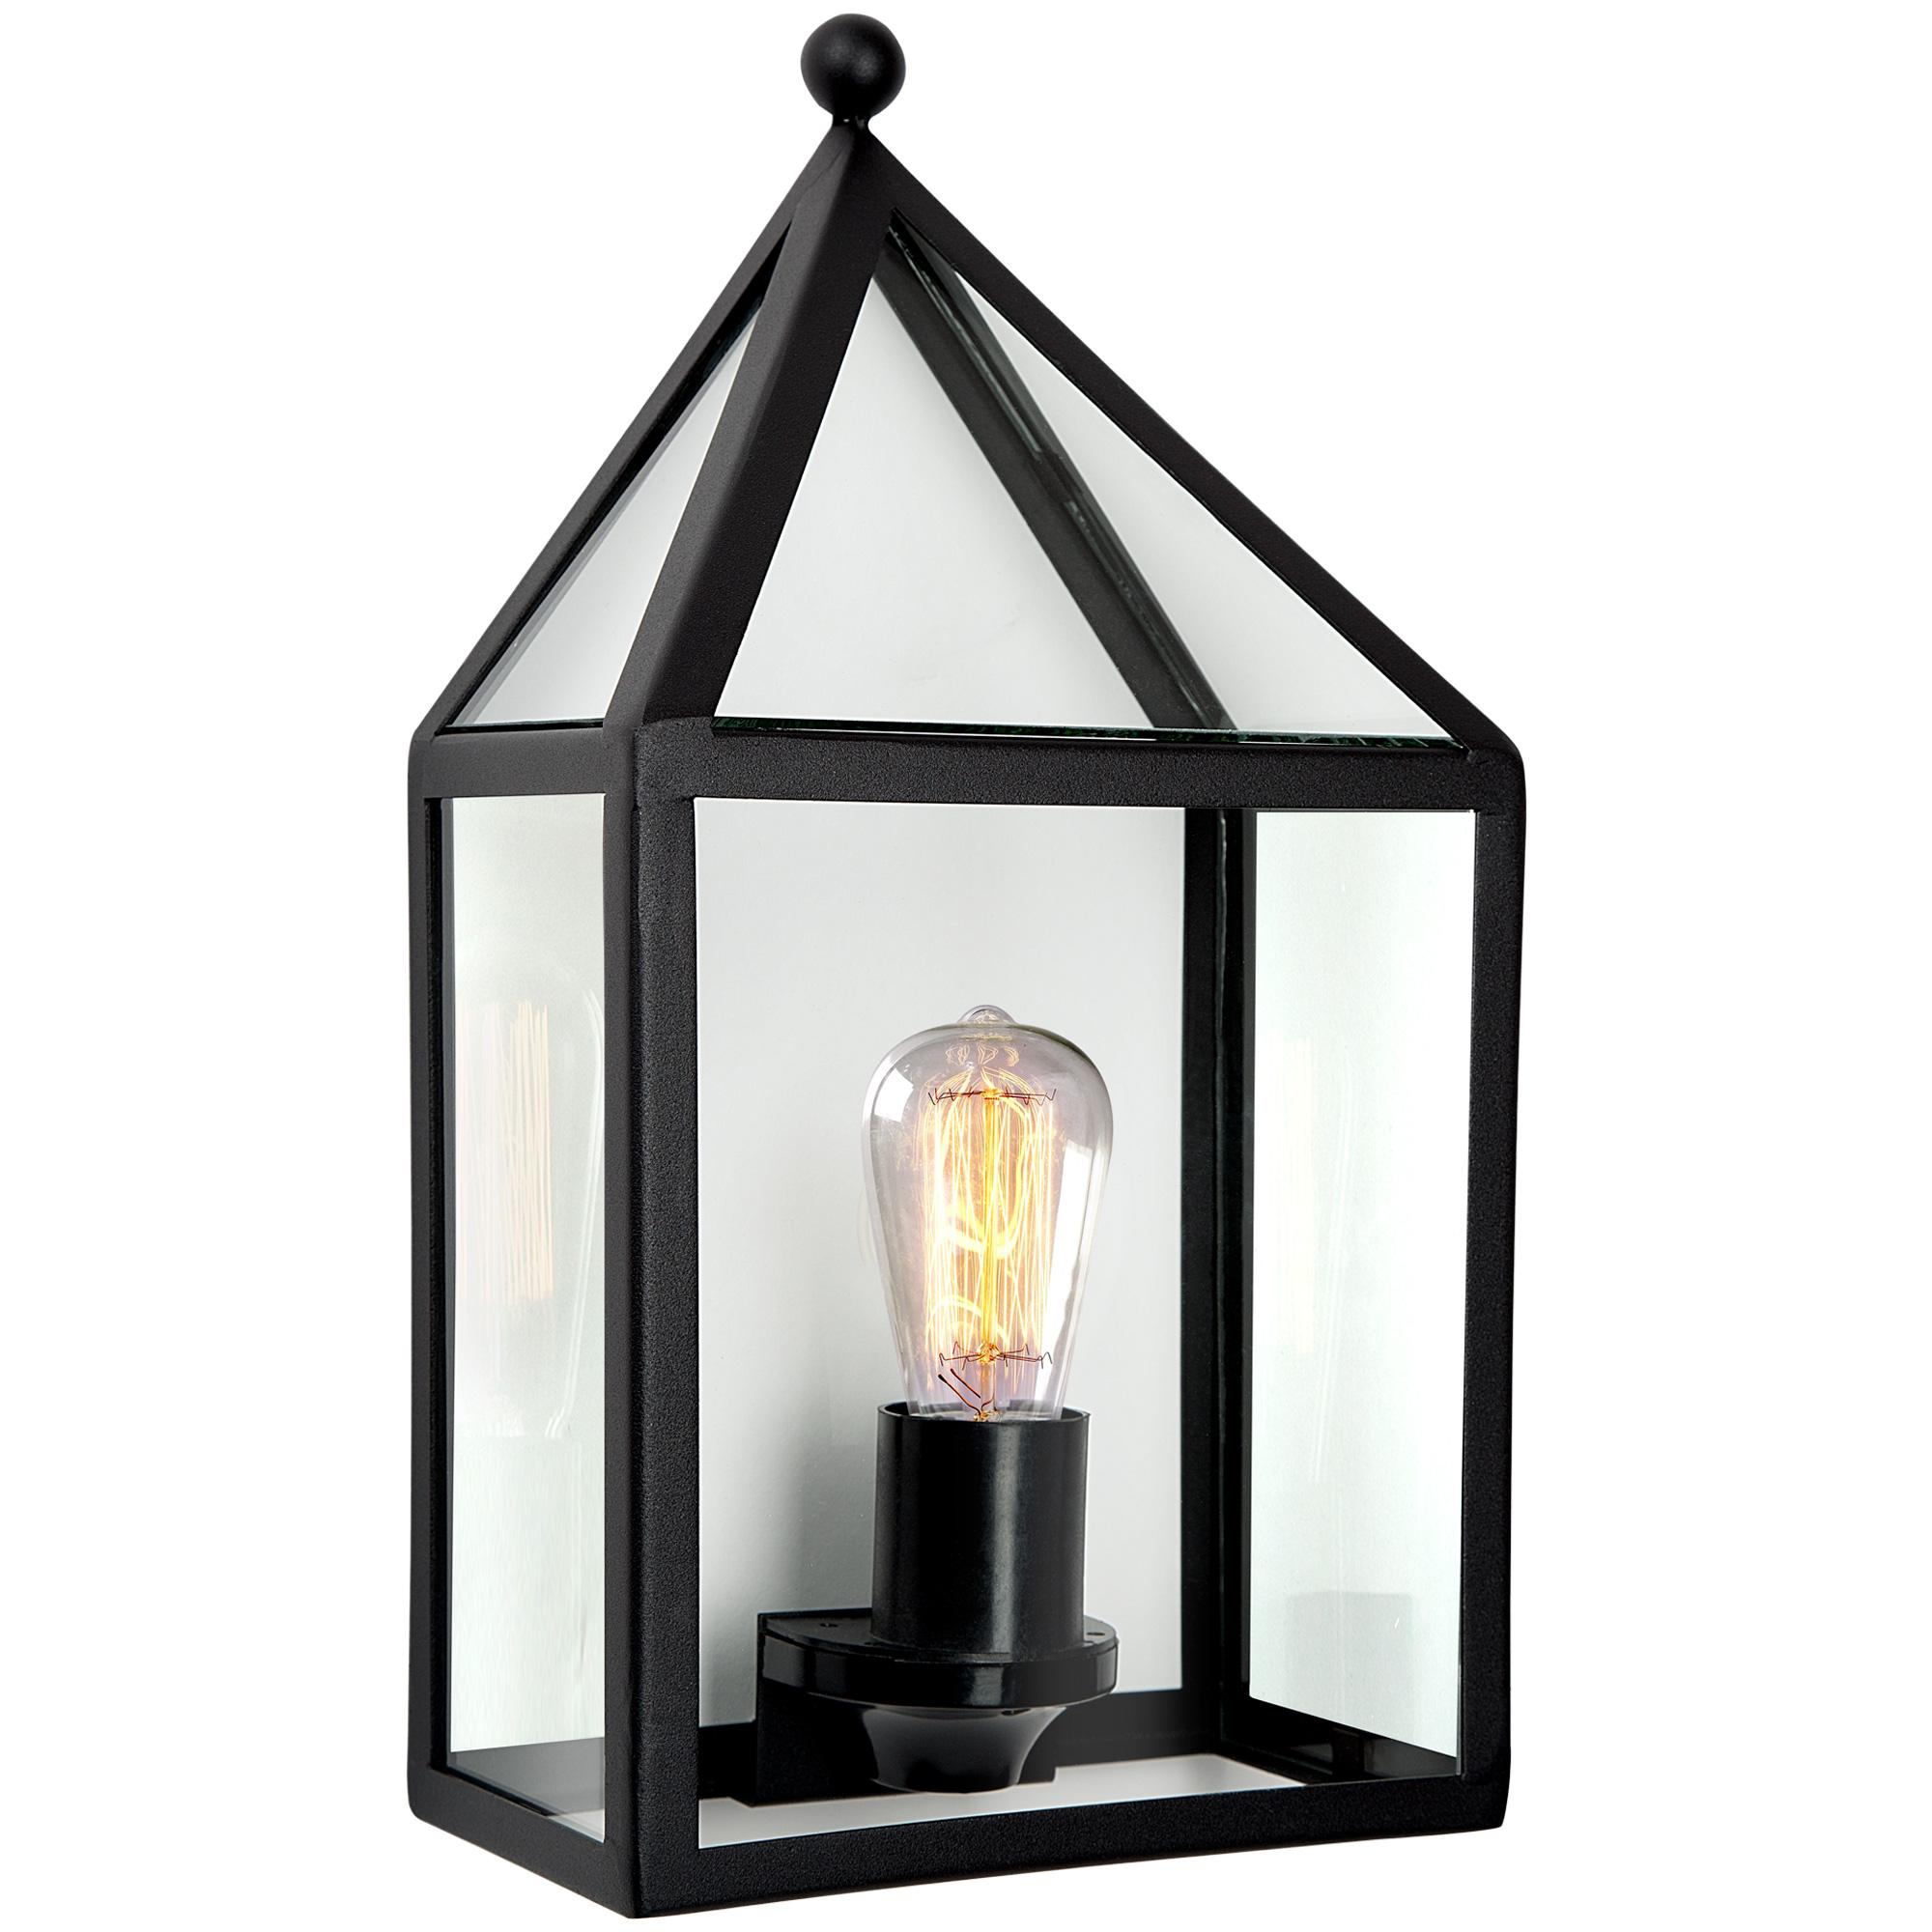 Buitenwandlamp Leusden Wandlamp Plat Zwart